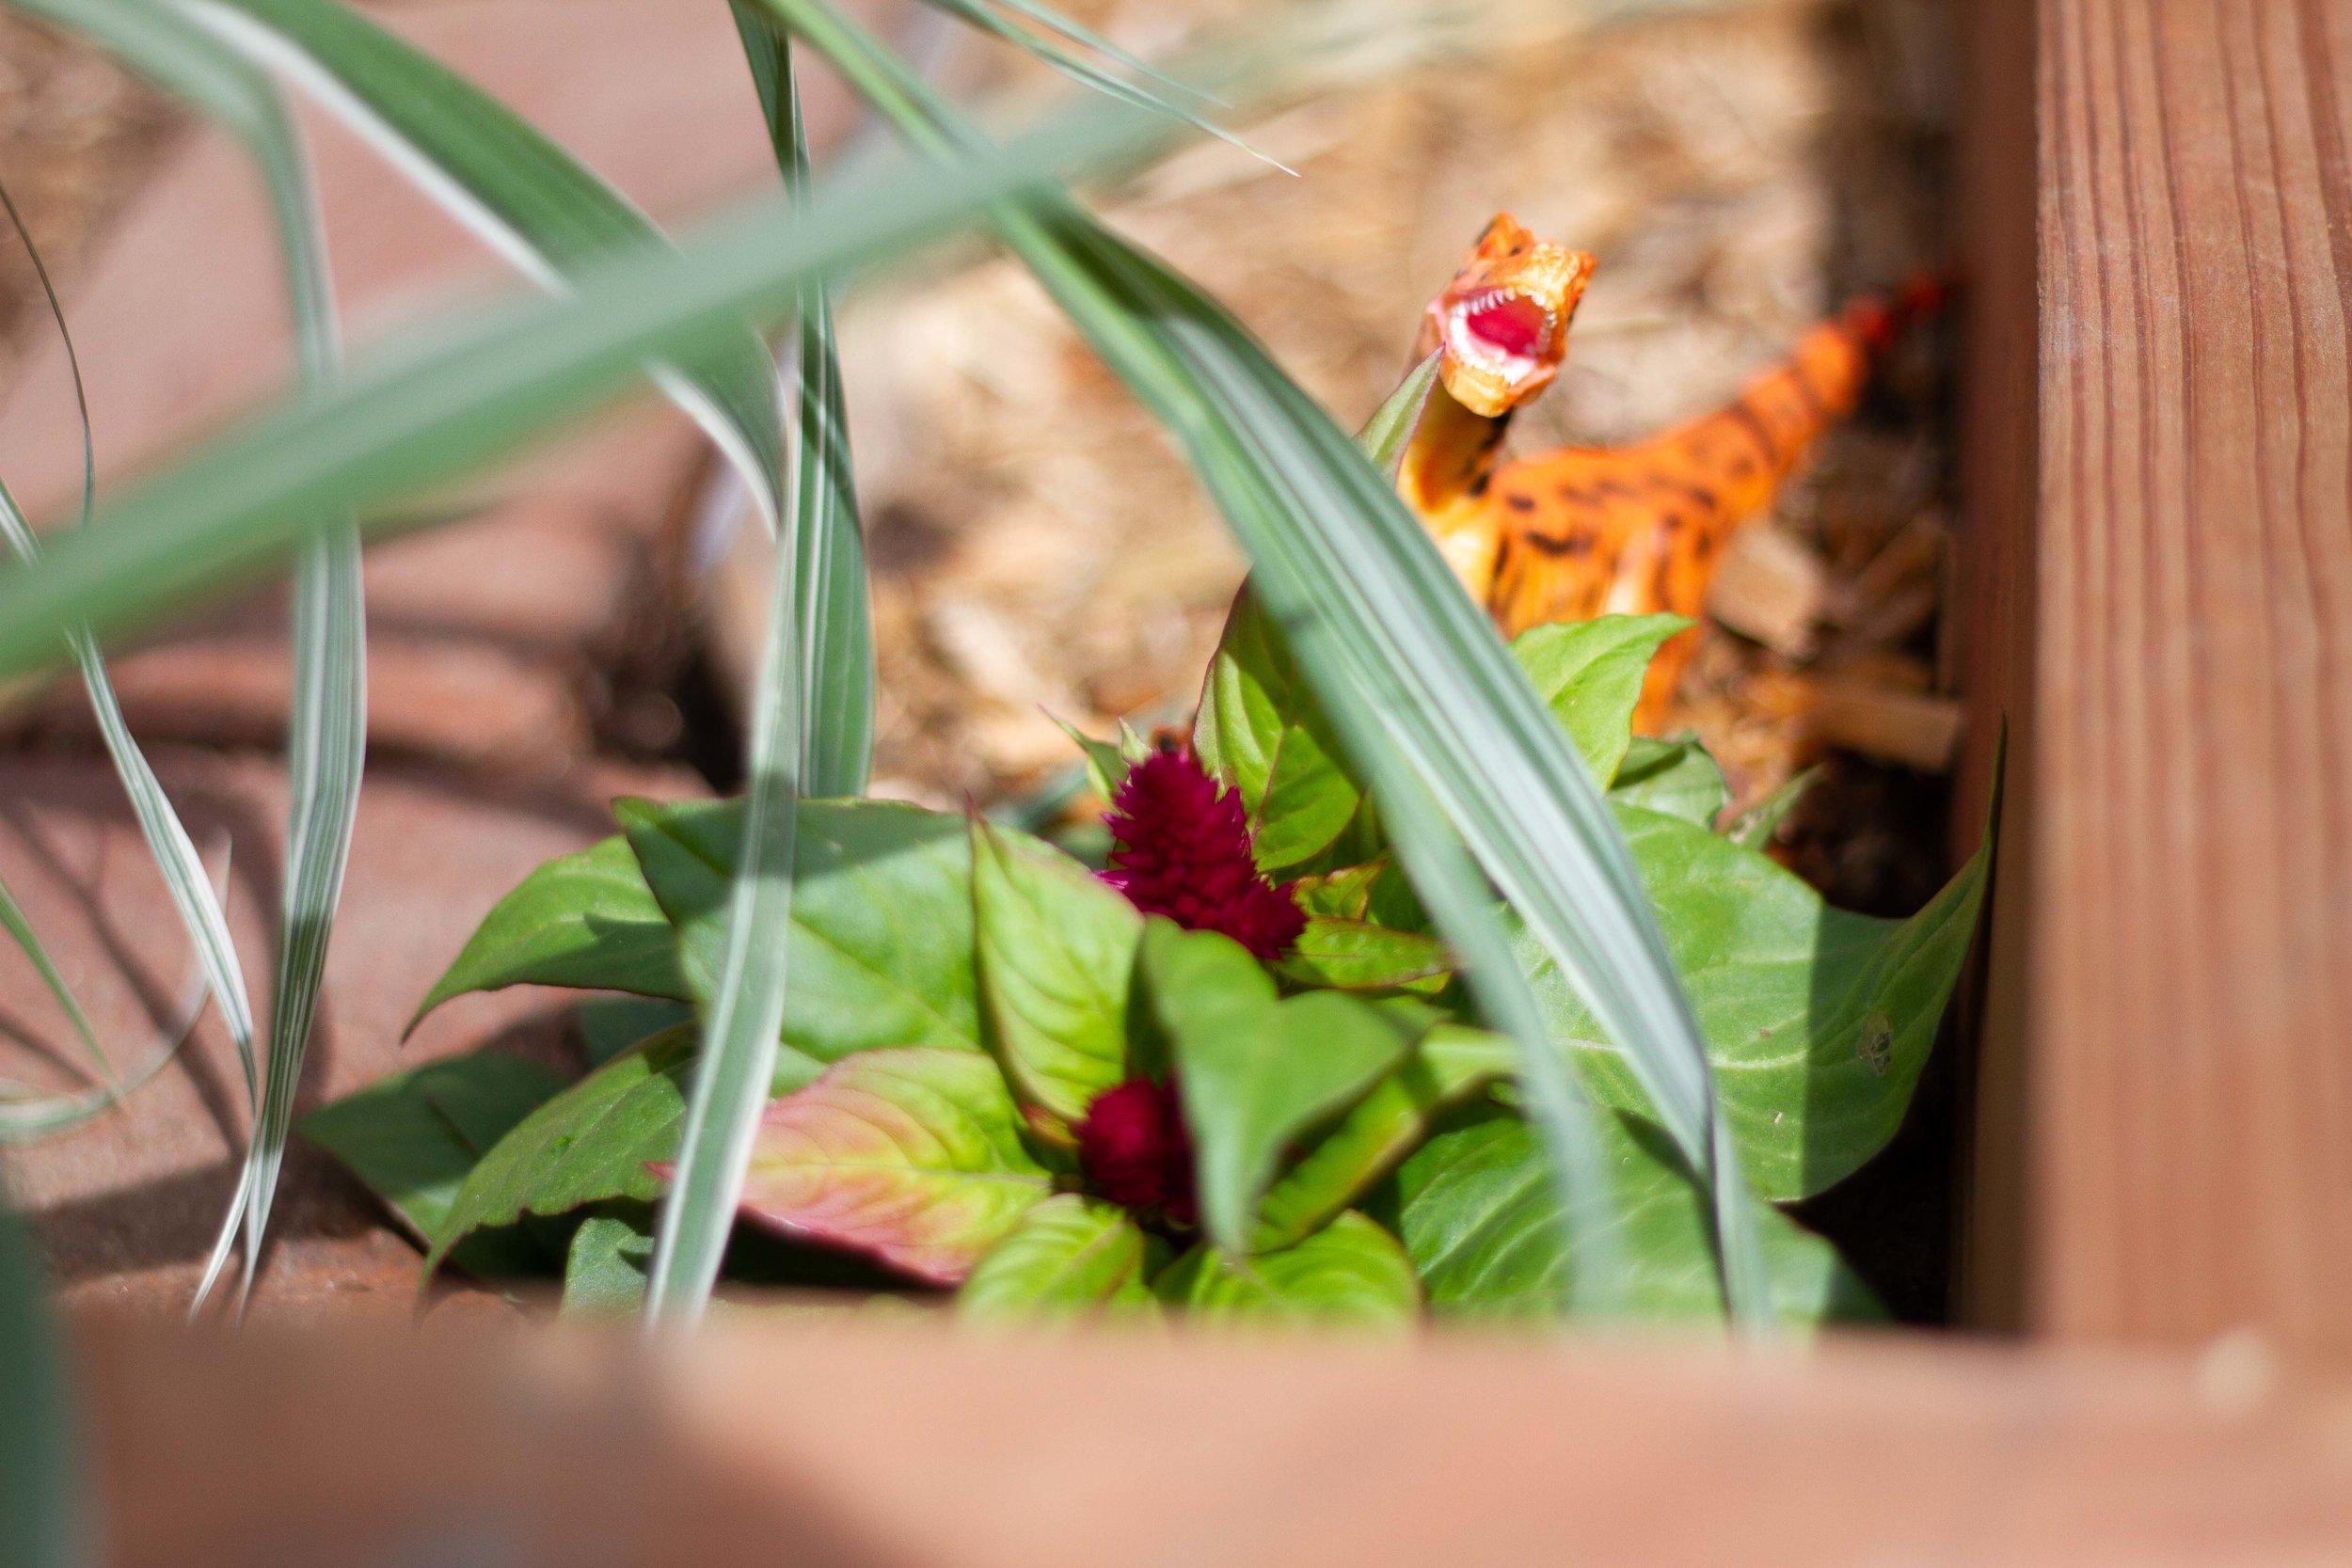 dino garden-5749.jpg